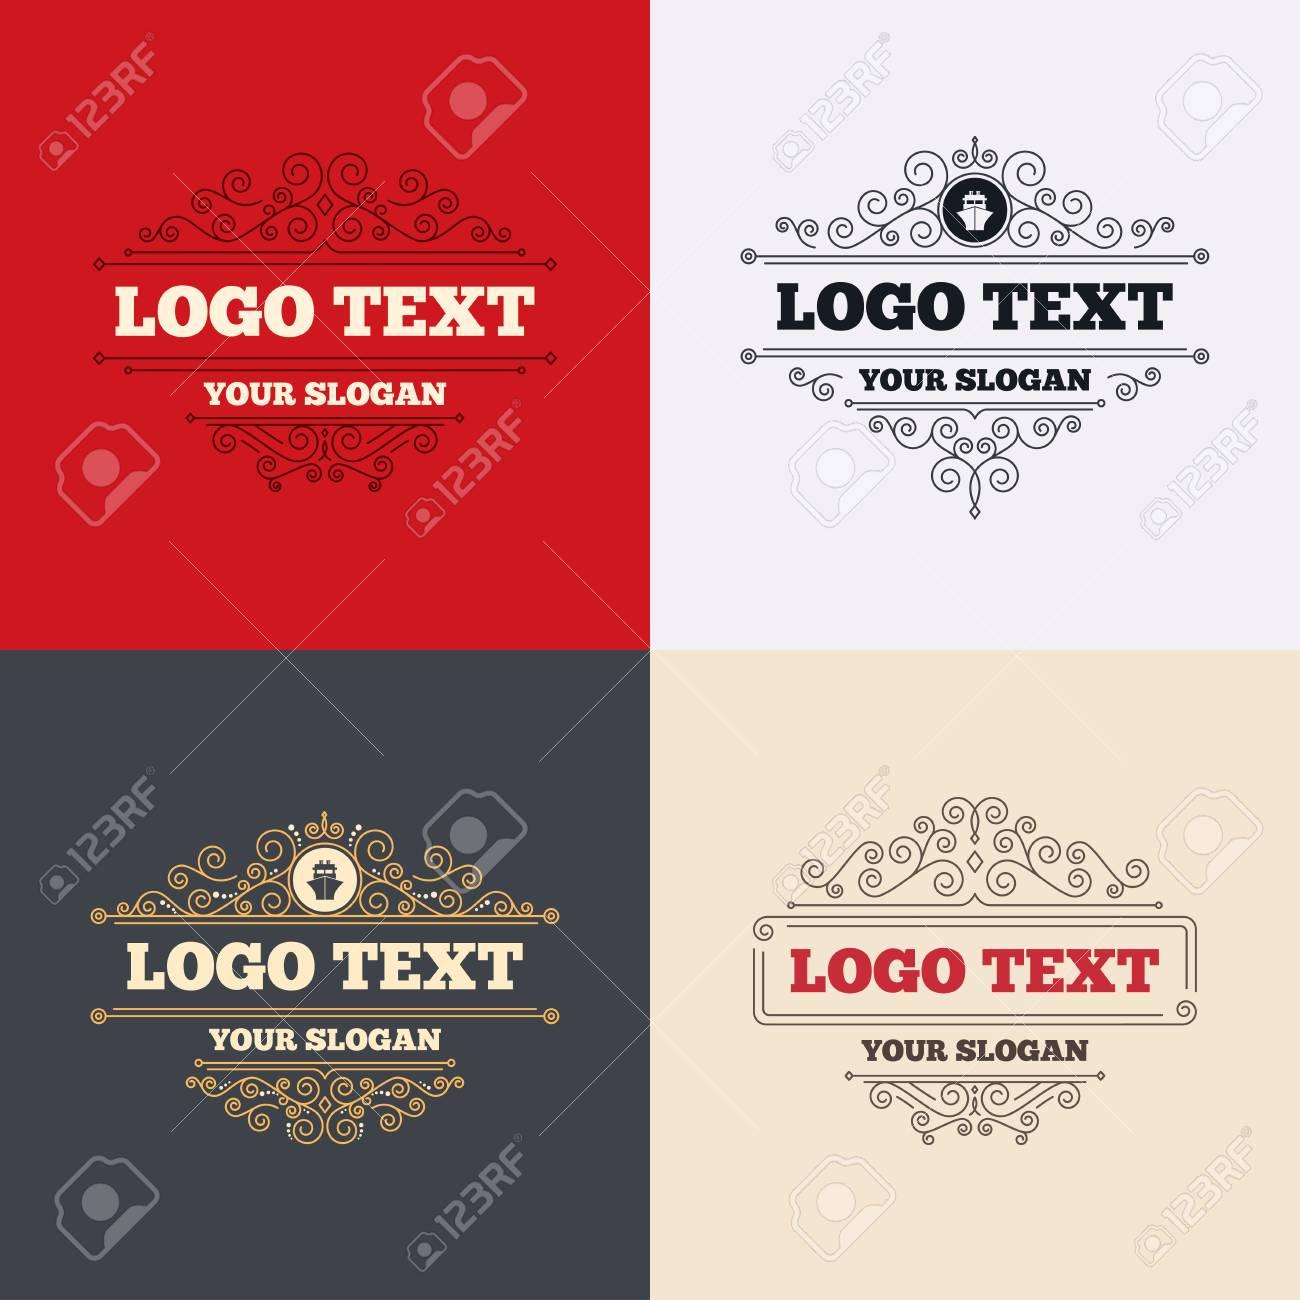 Royal flourishes calligraphic ship or boat sign icon shipping royal flourishes calligraphic ship or boat sign icon shipping delivery symbol luxury ornament buycottarizona